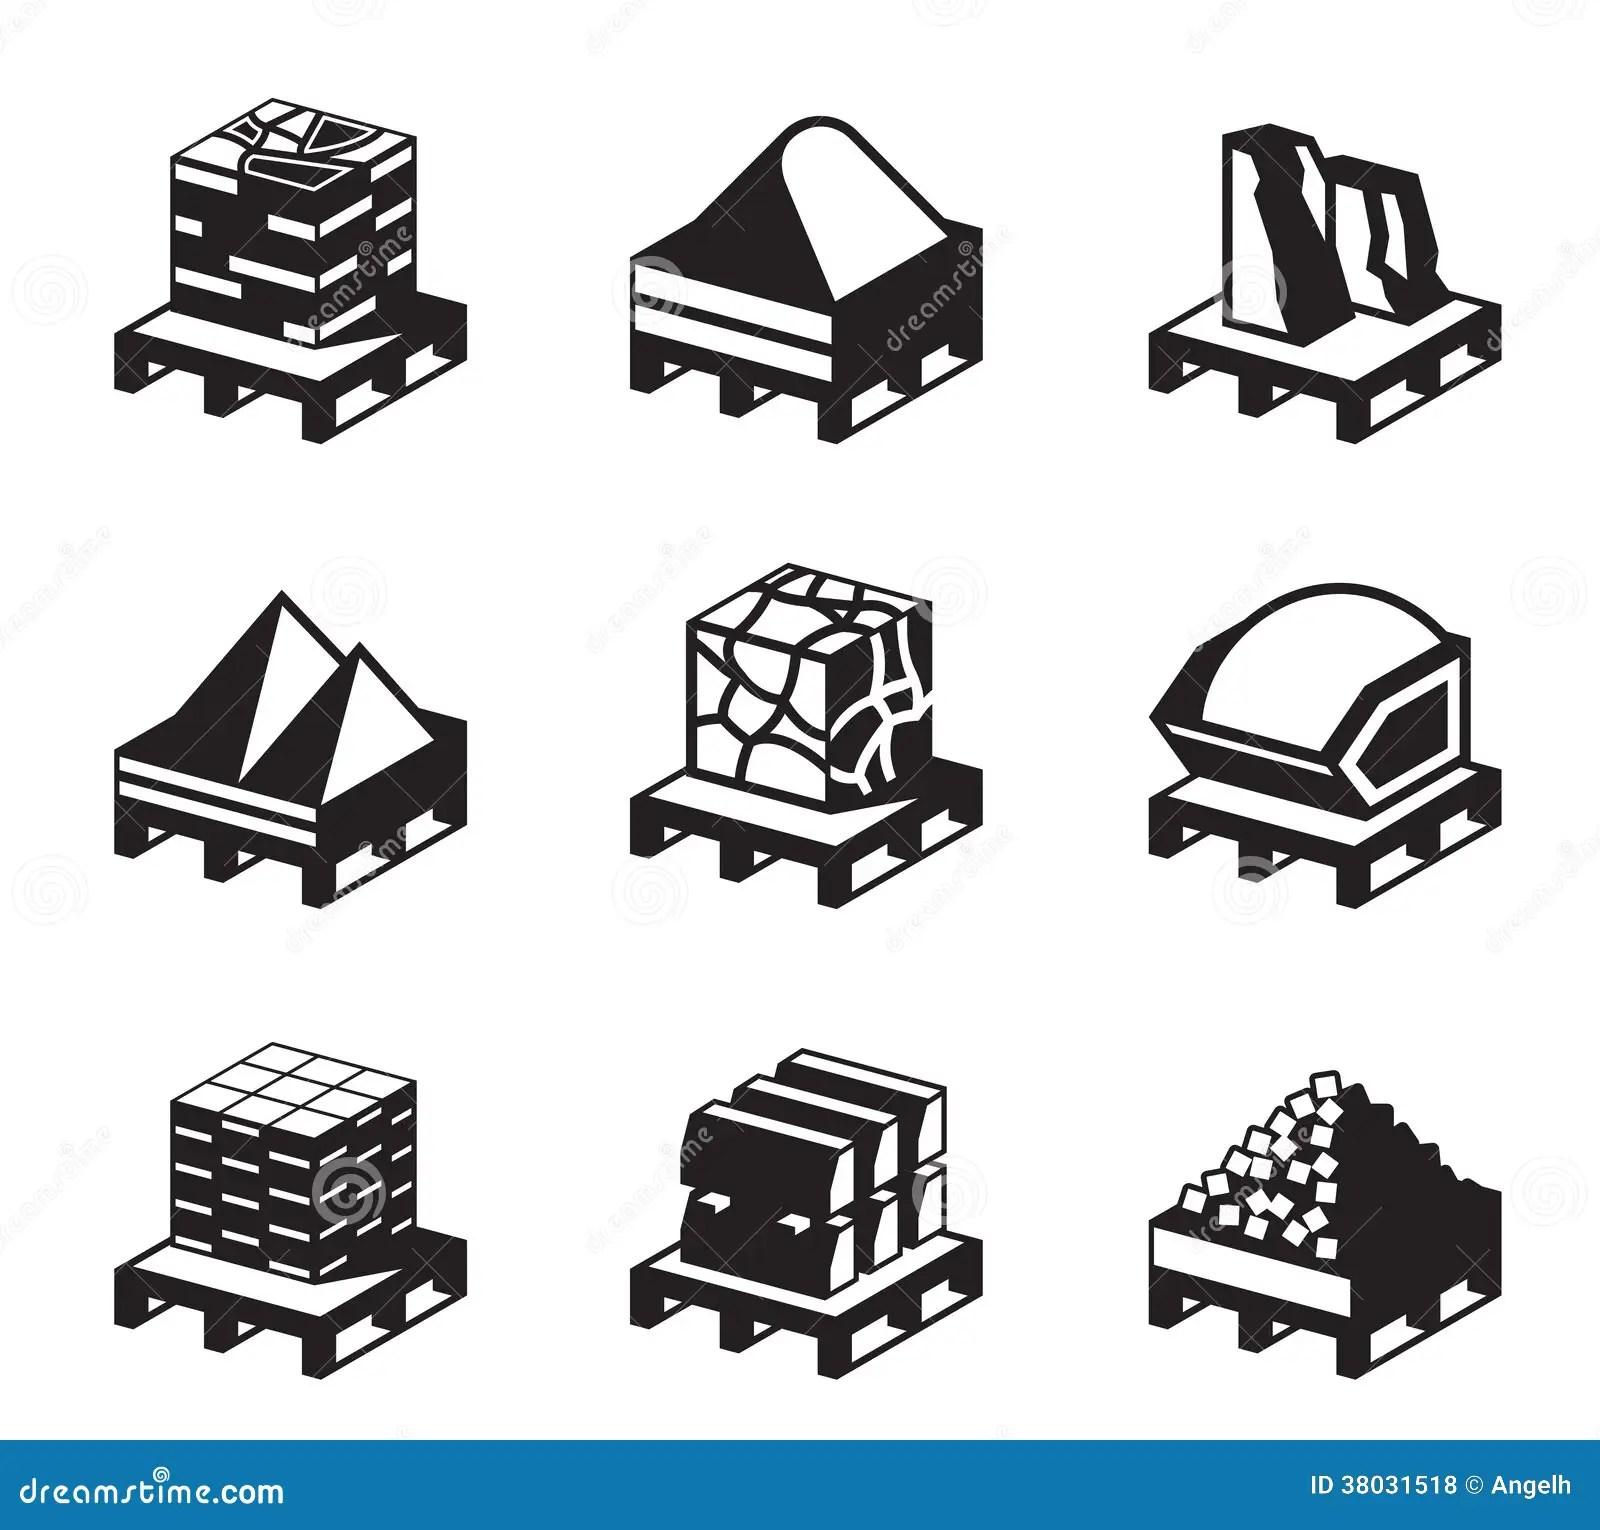 Construction Materials Royalty Free Stock Photos